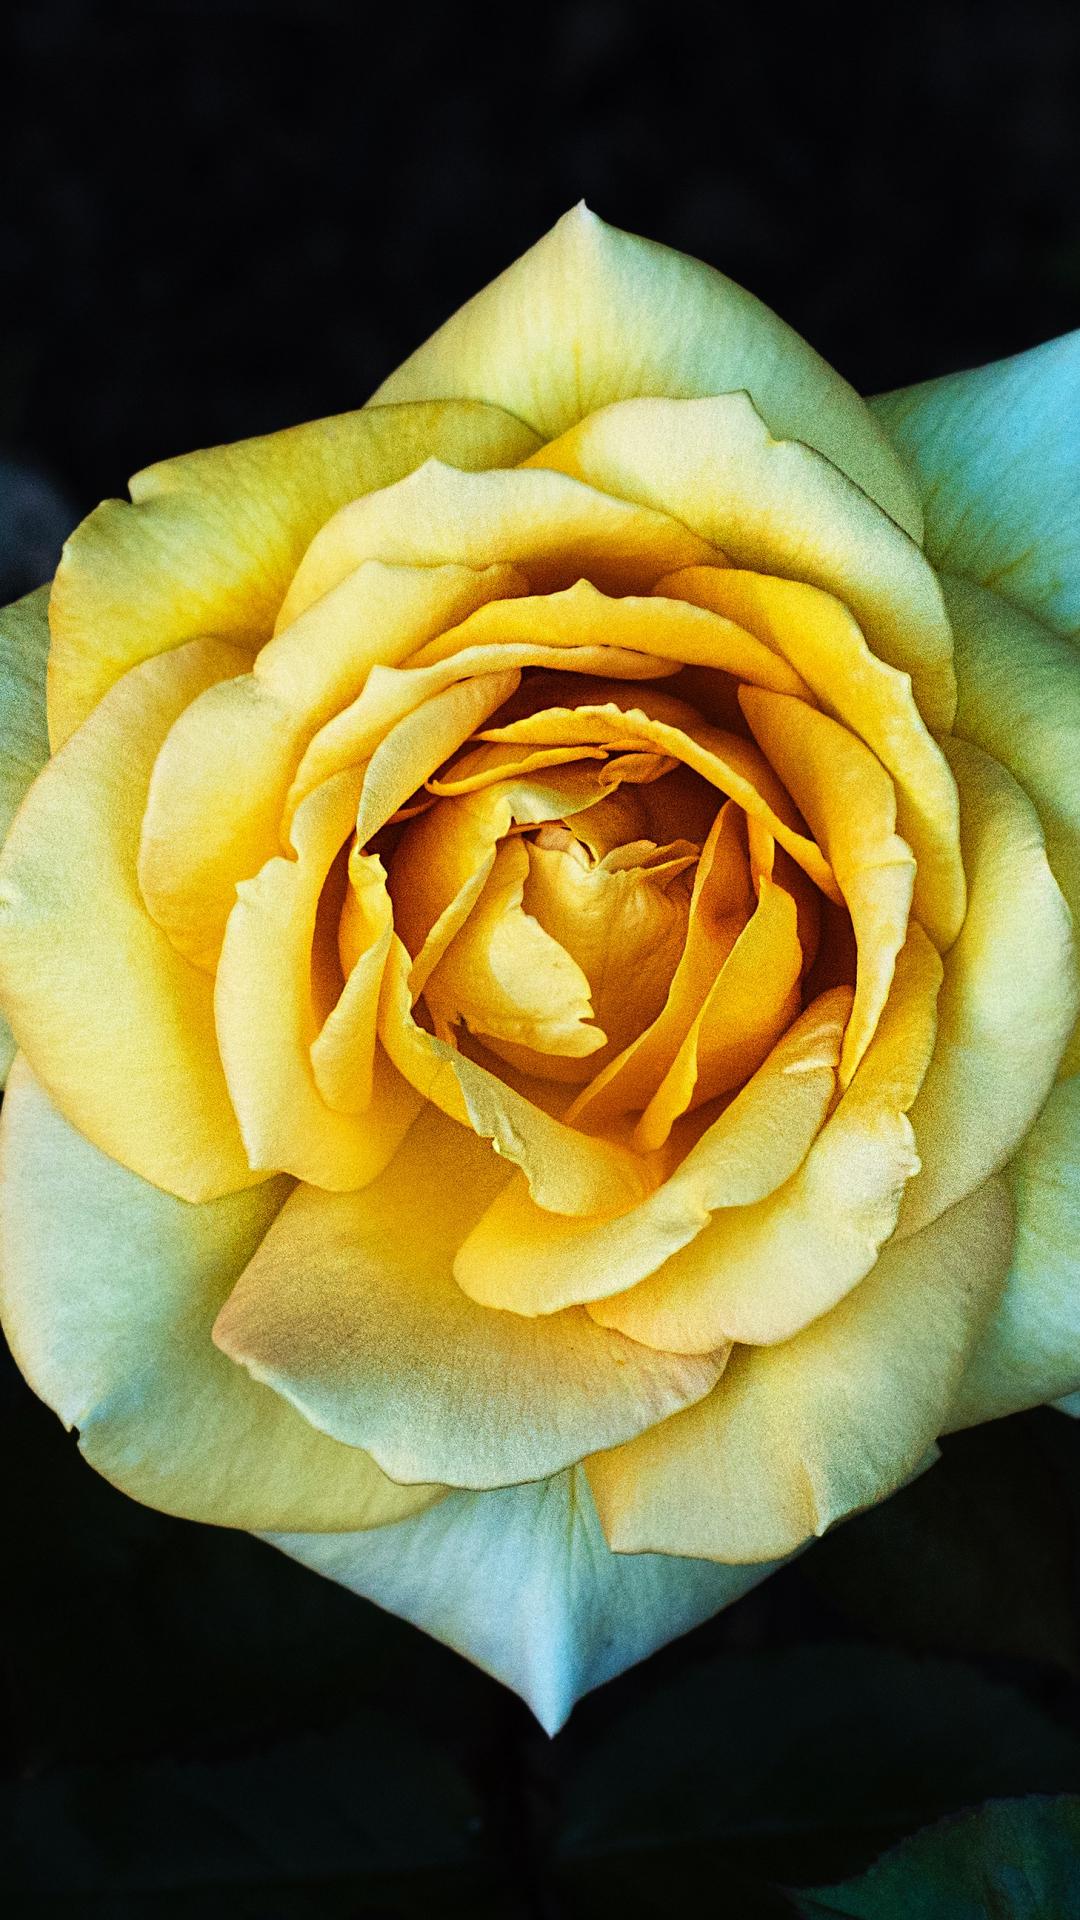 Flower, Rose iPhone Wallpaper